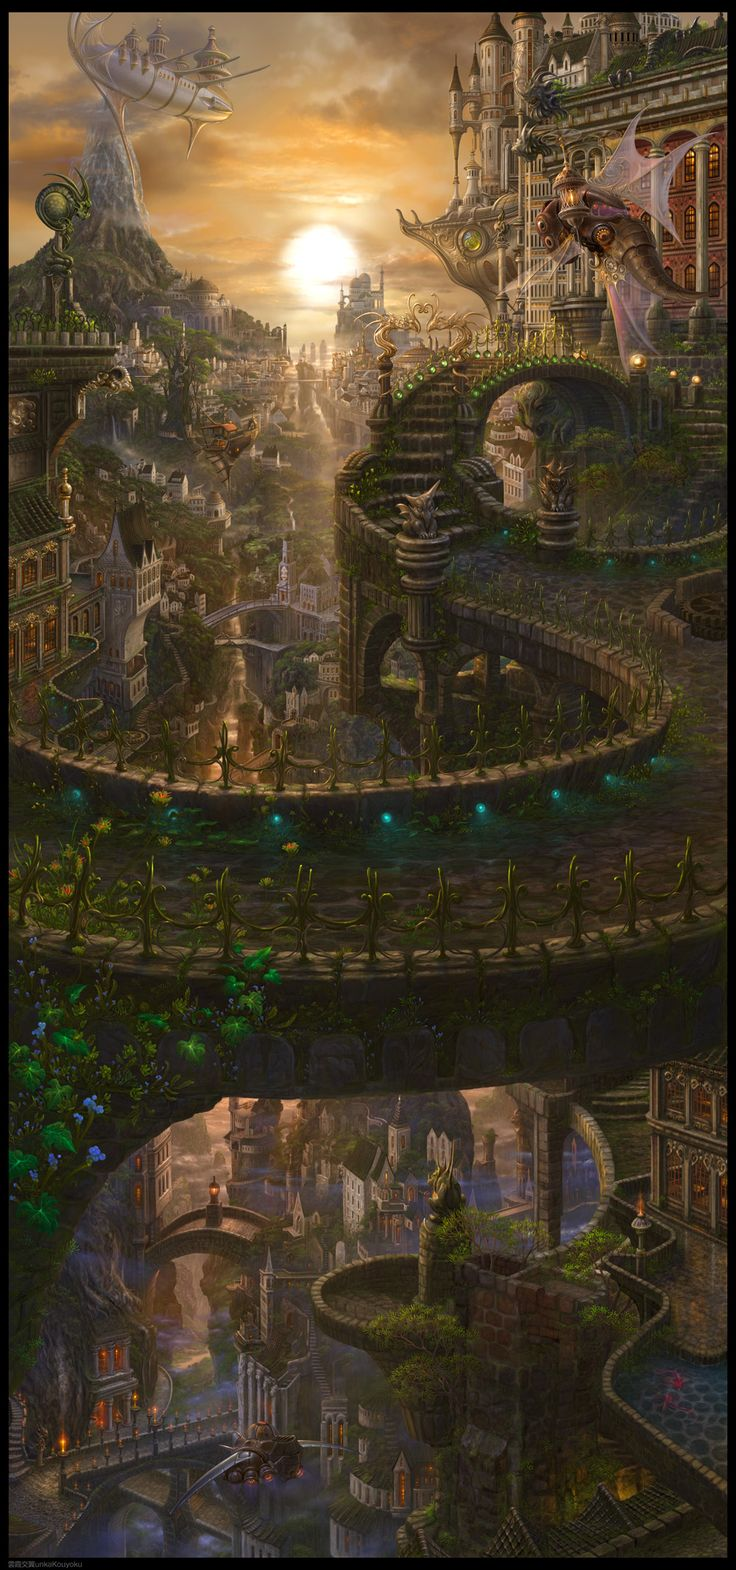 magic castle fantasy world - photo #32